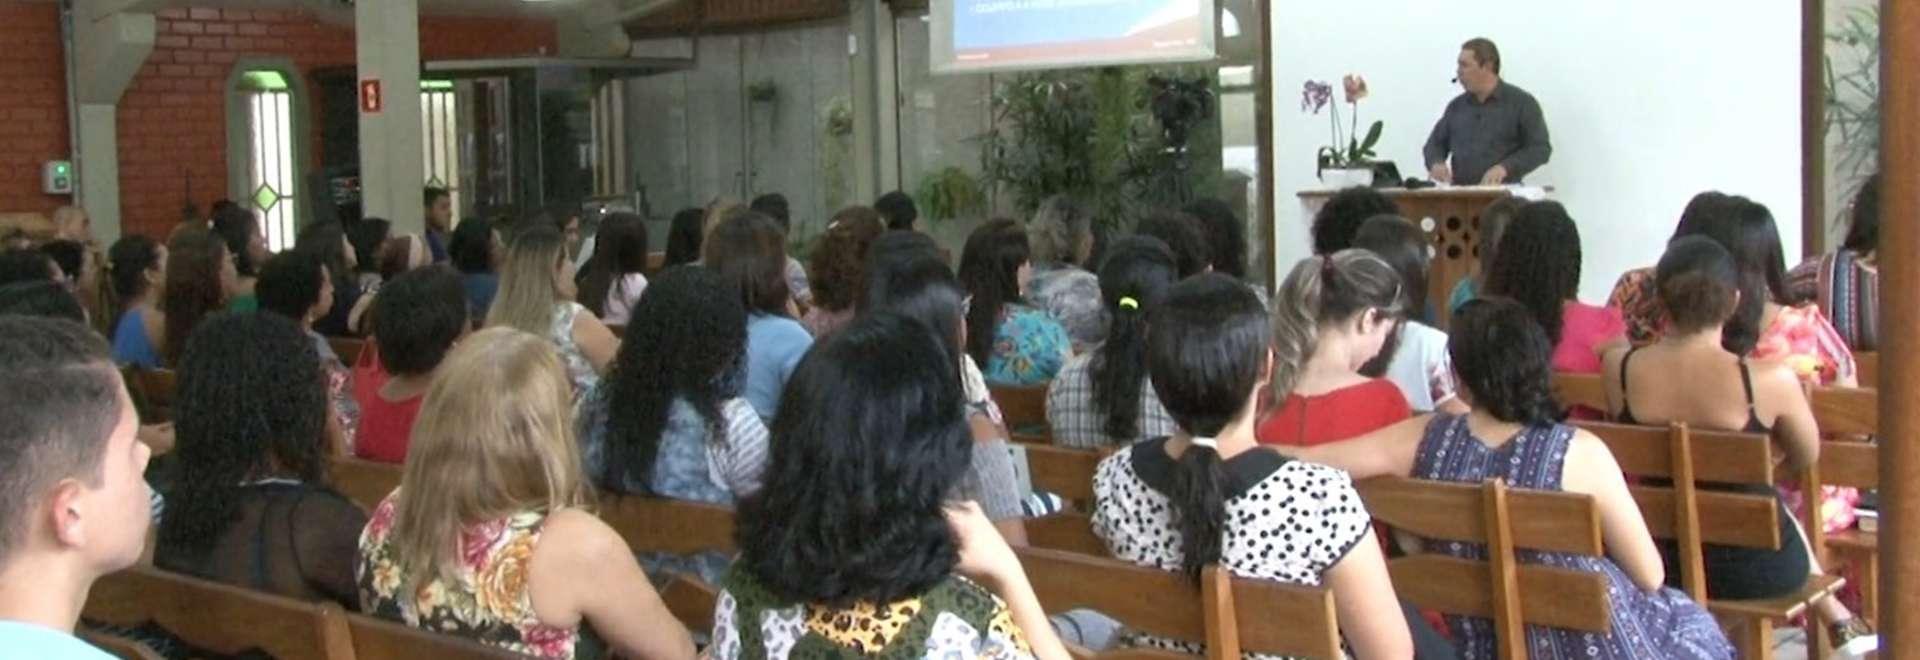 Encontro de Louvor - Igreja Cristã Maranata de Paul, Vila Velha (ES)